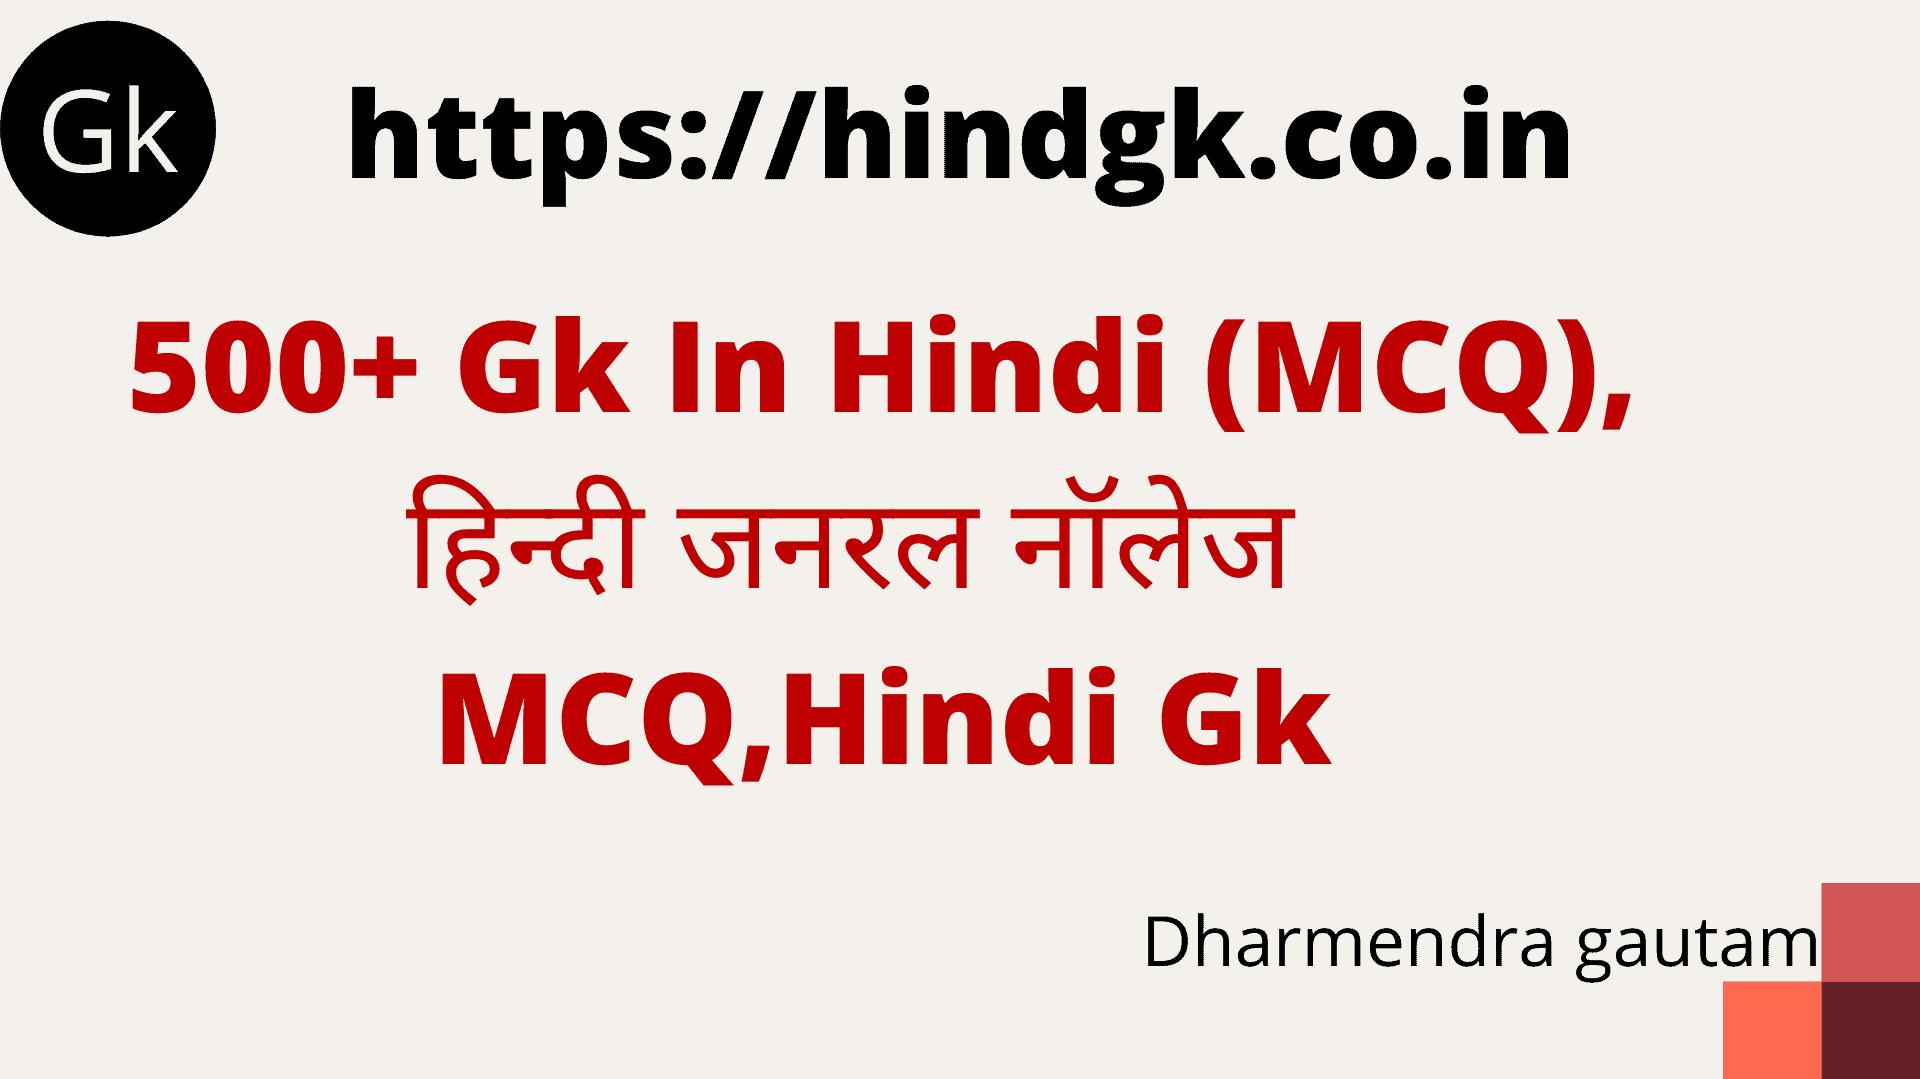 Gk In Hindi सामान्य ज्ञान से संबंधित Top 100 General Knowledge 2021 Quiz Questions and Answers